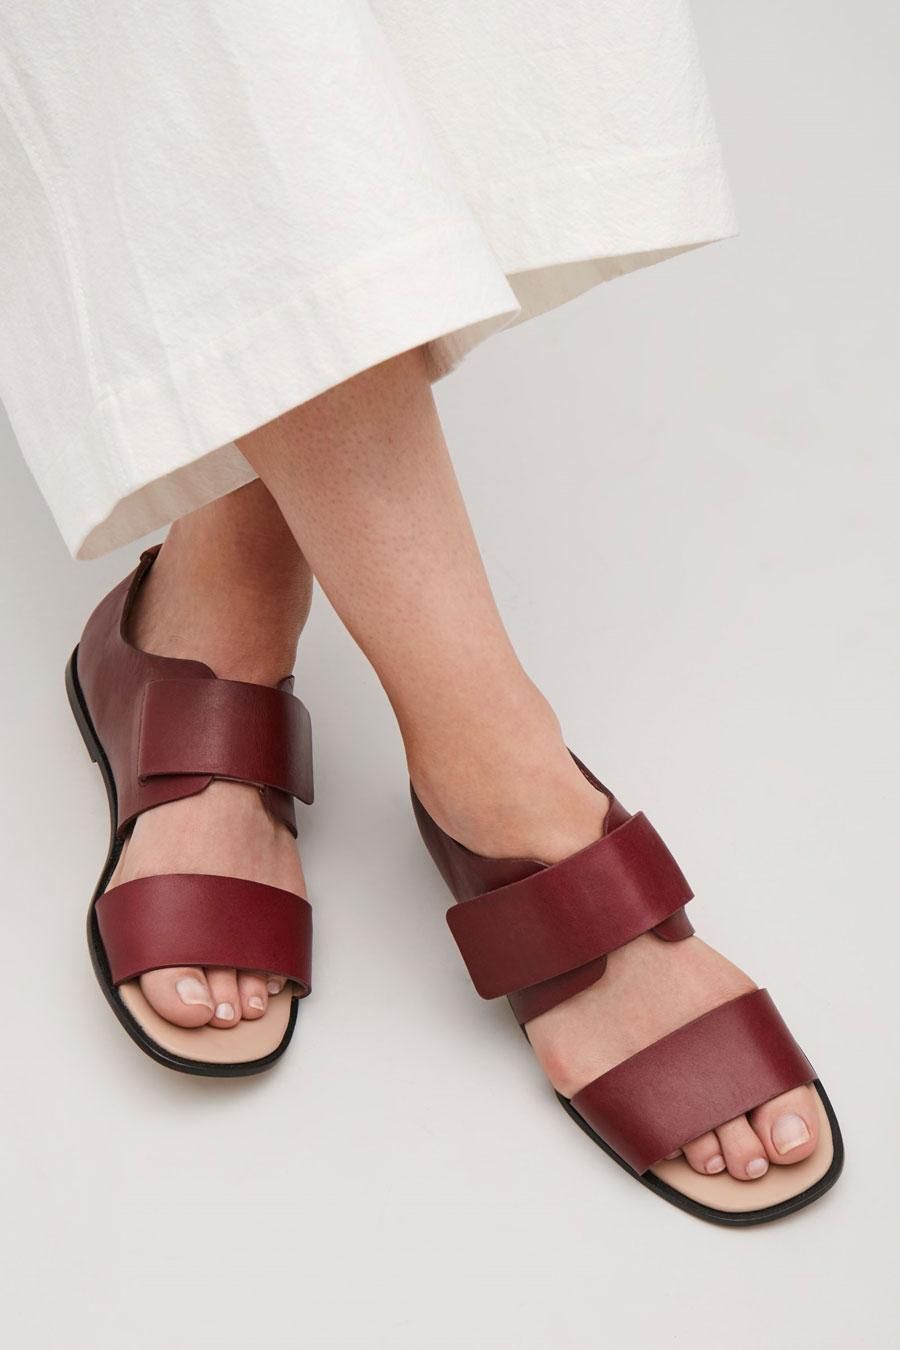 ad9b877ef556 Sommarens snyggaste sandaler – 15 stilsäkra modeller - Metro Mode